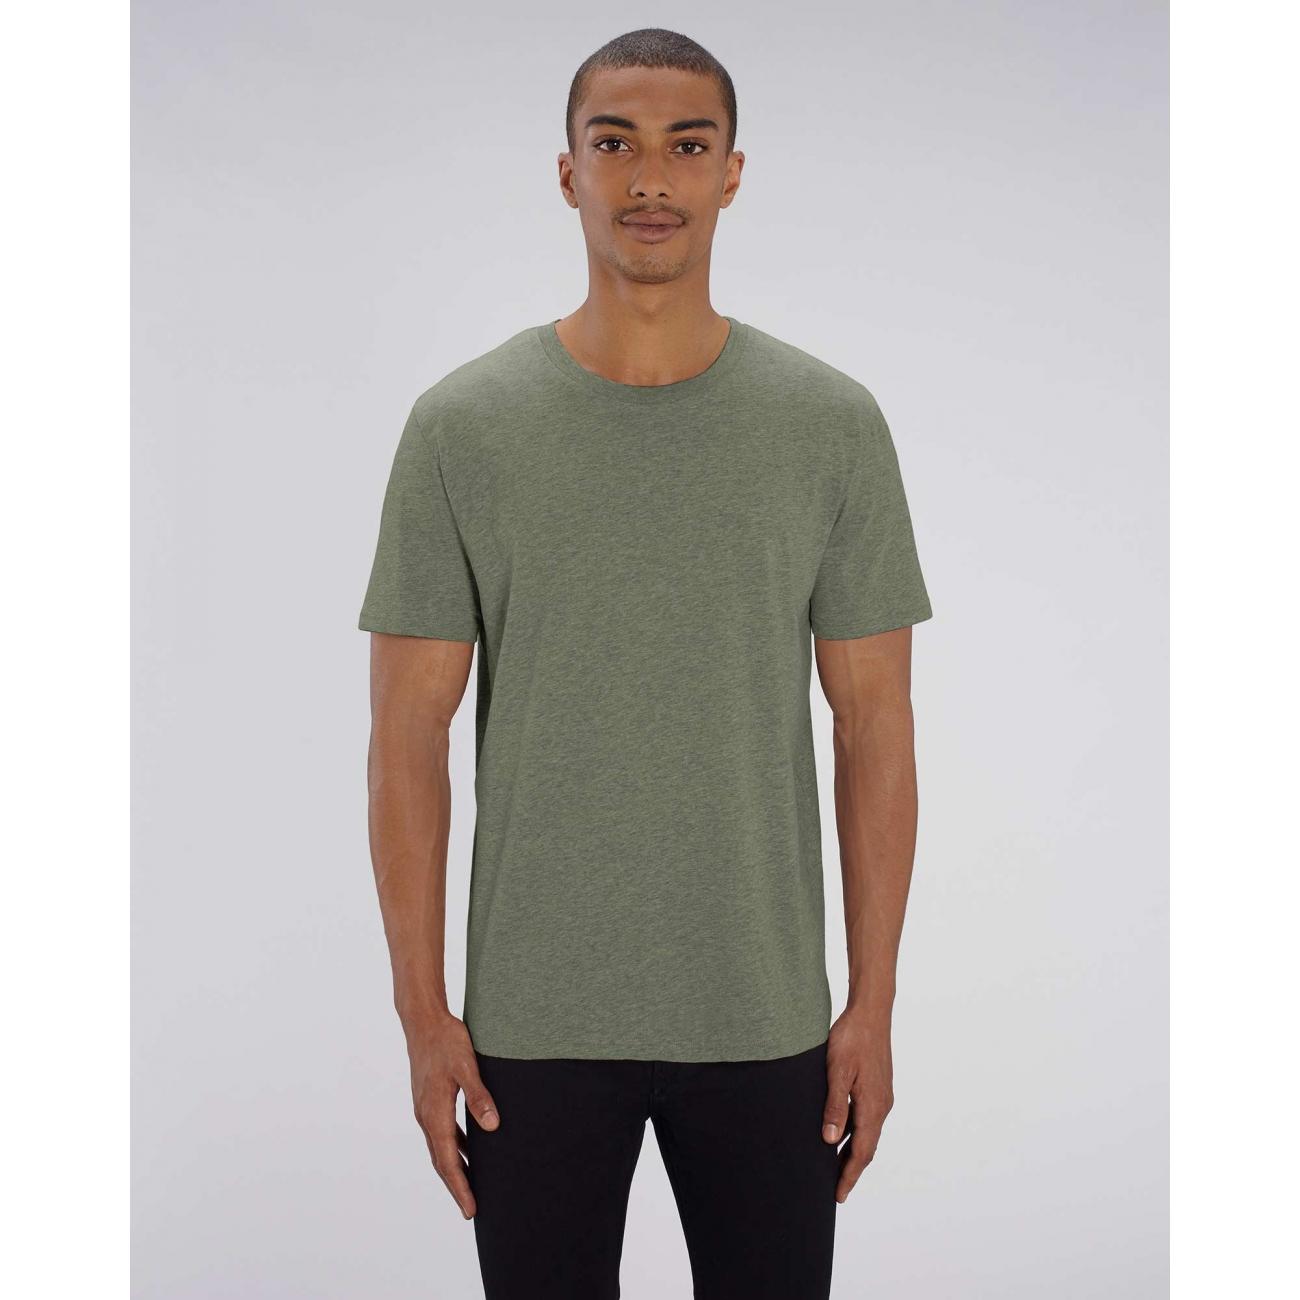 https://tee-shirt-bio.com/9598-thickbox_default/tee-shirt-classique-col-rond-homme-en-coton-bio-fwf-kaki-chine.jpg